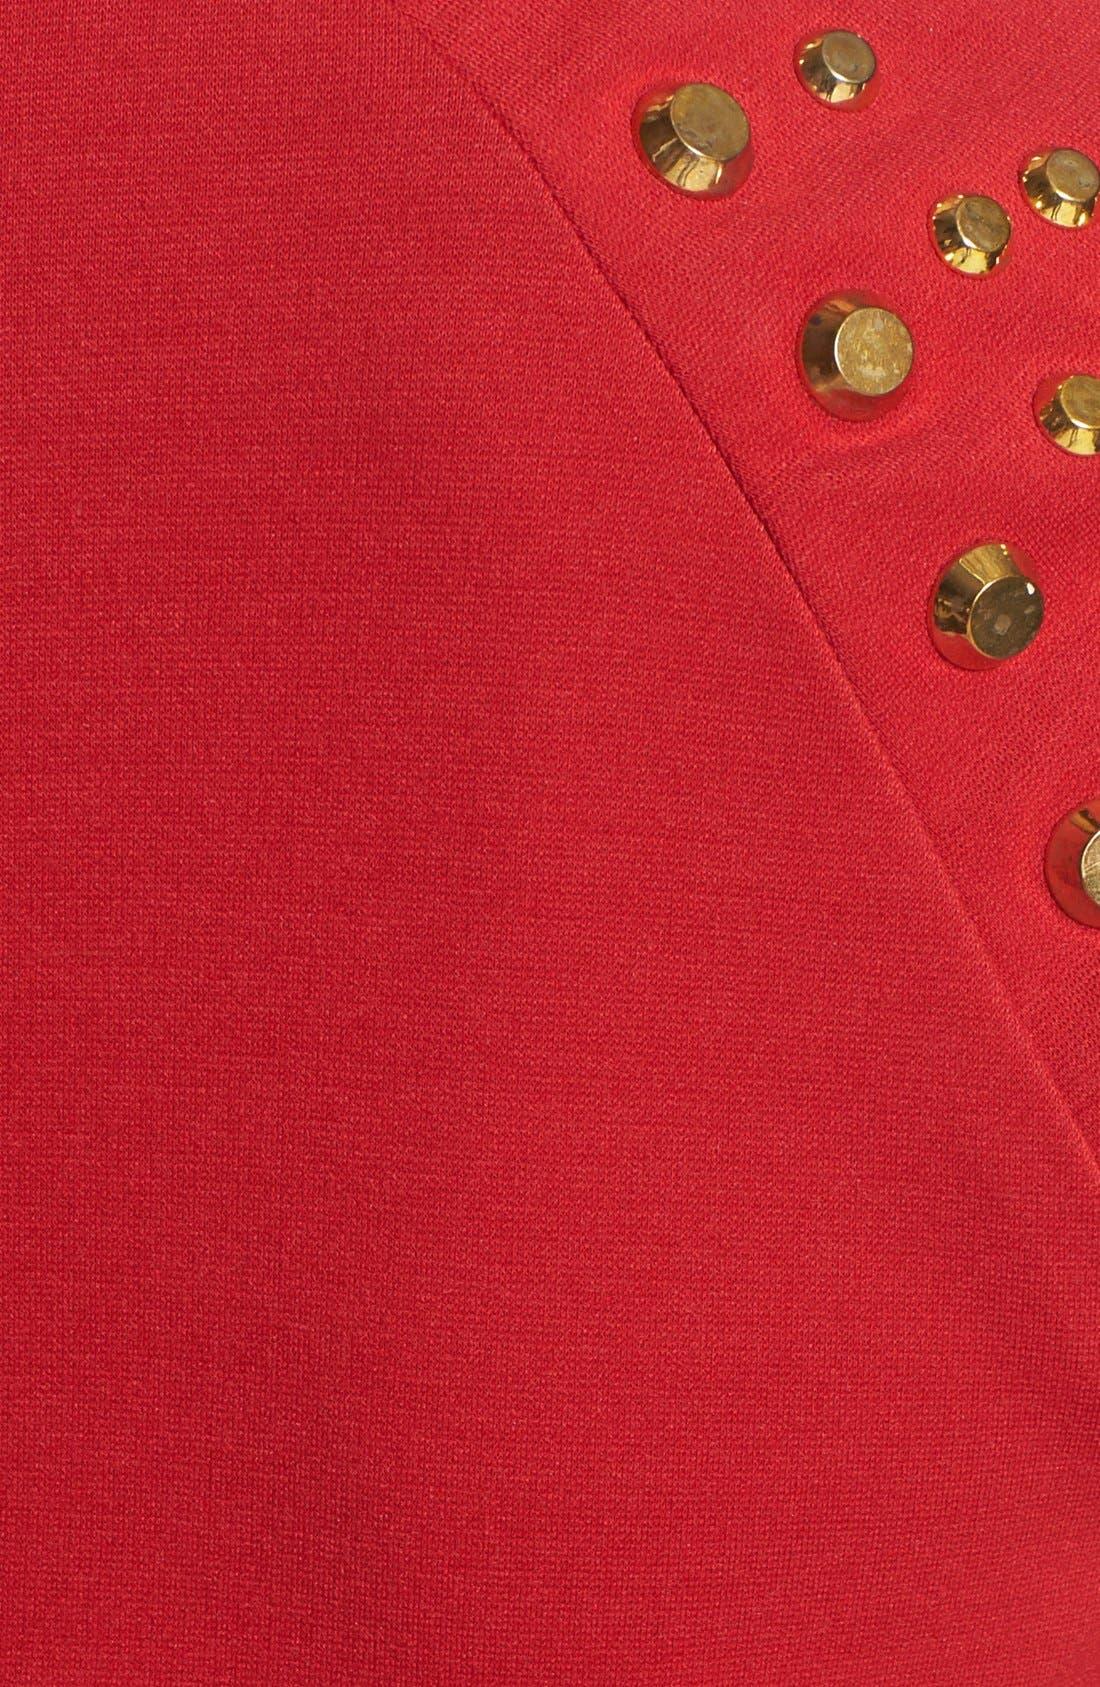 Alternate Image 3  - MICHAEL Michael Kors Studded Sleeve Ponte Dress